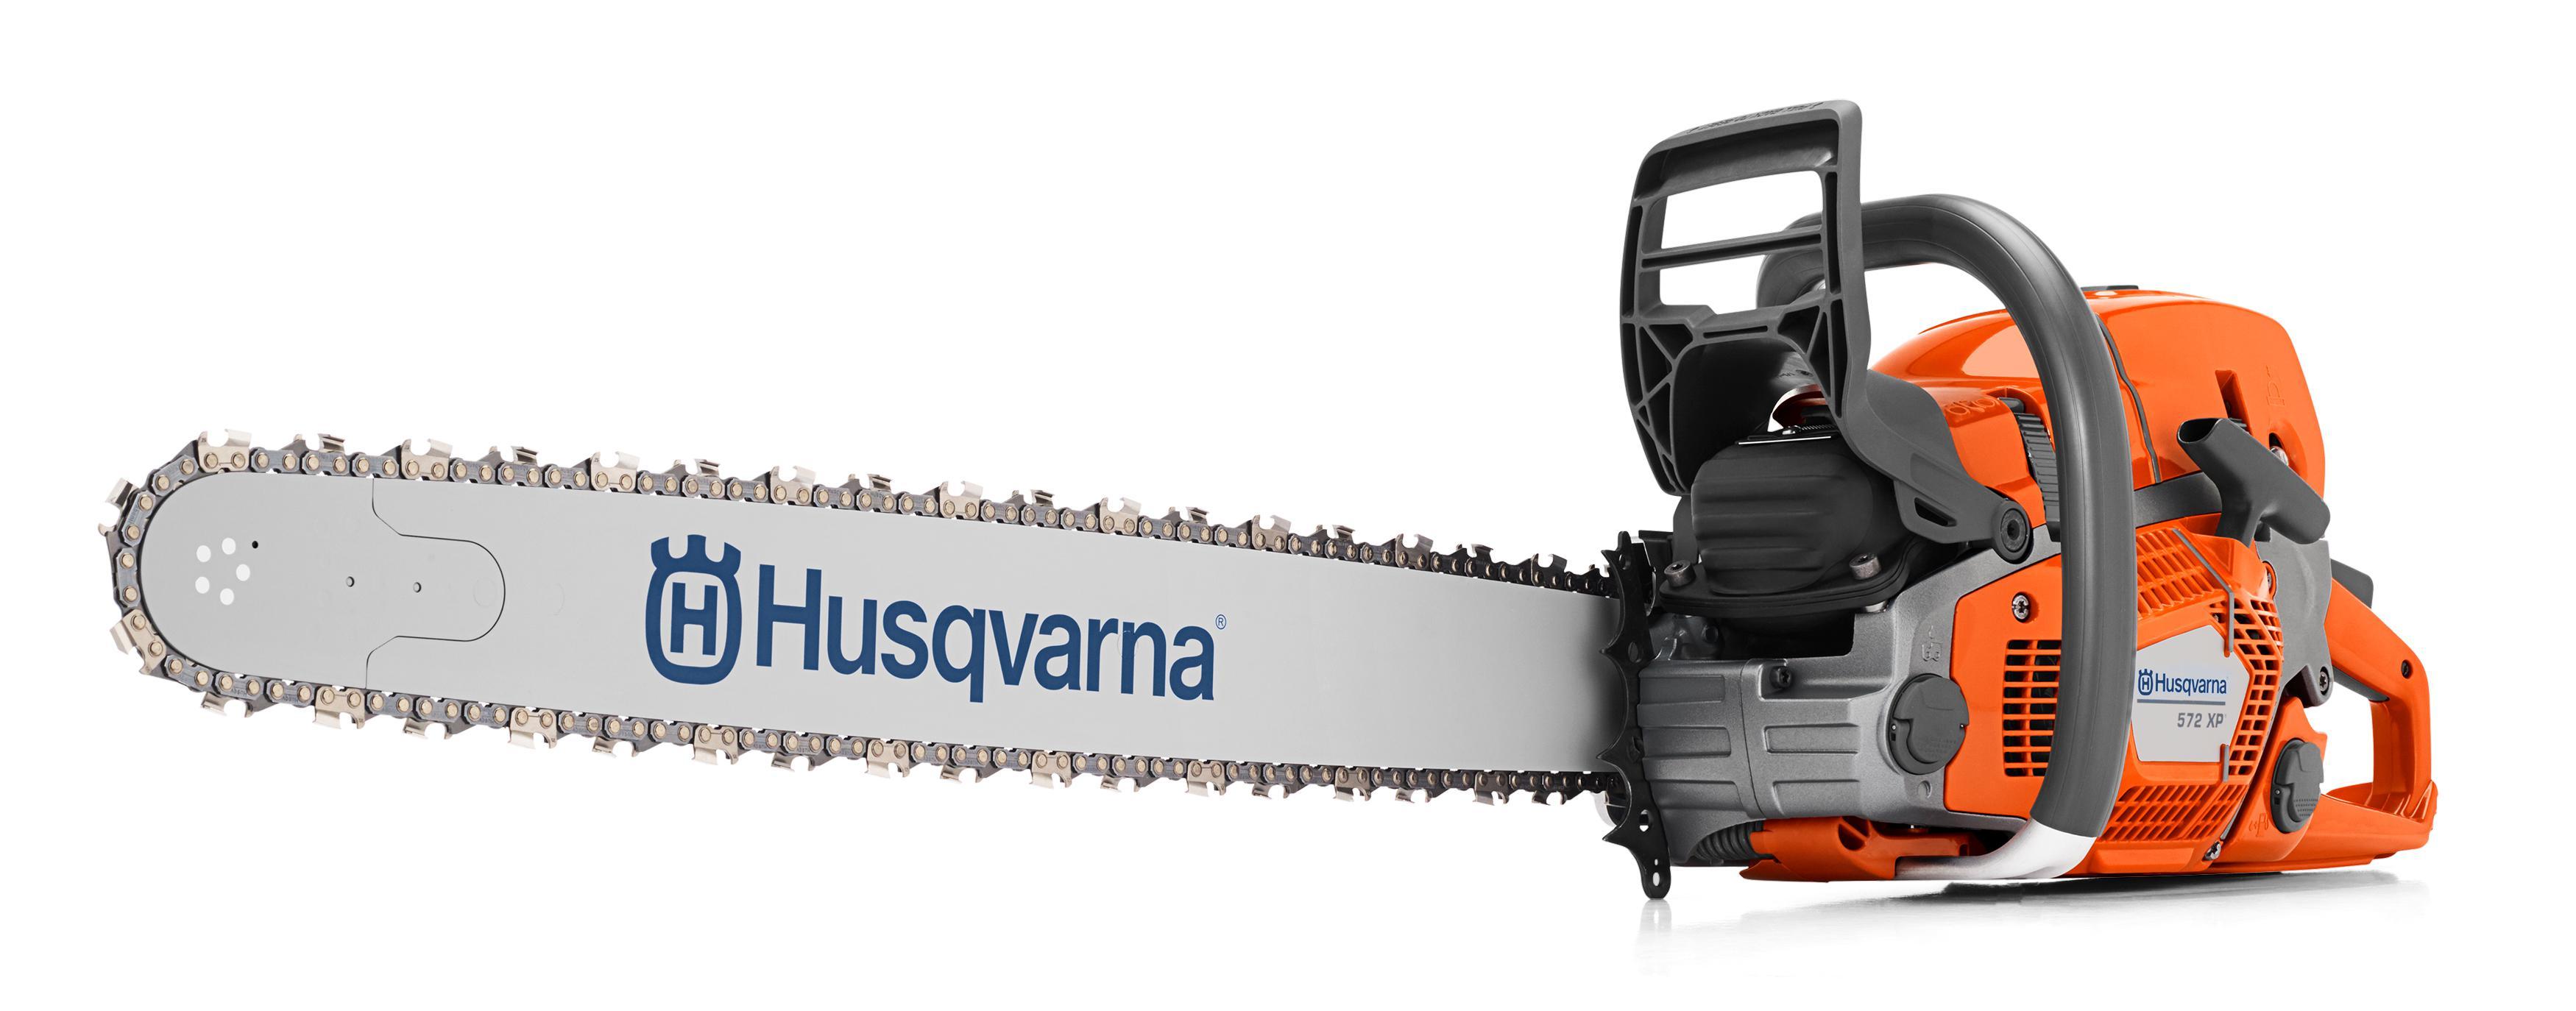 Бензопила Husqvarna 572xp (9667331-18) свеча husqvarna pr17y